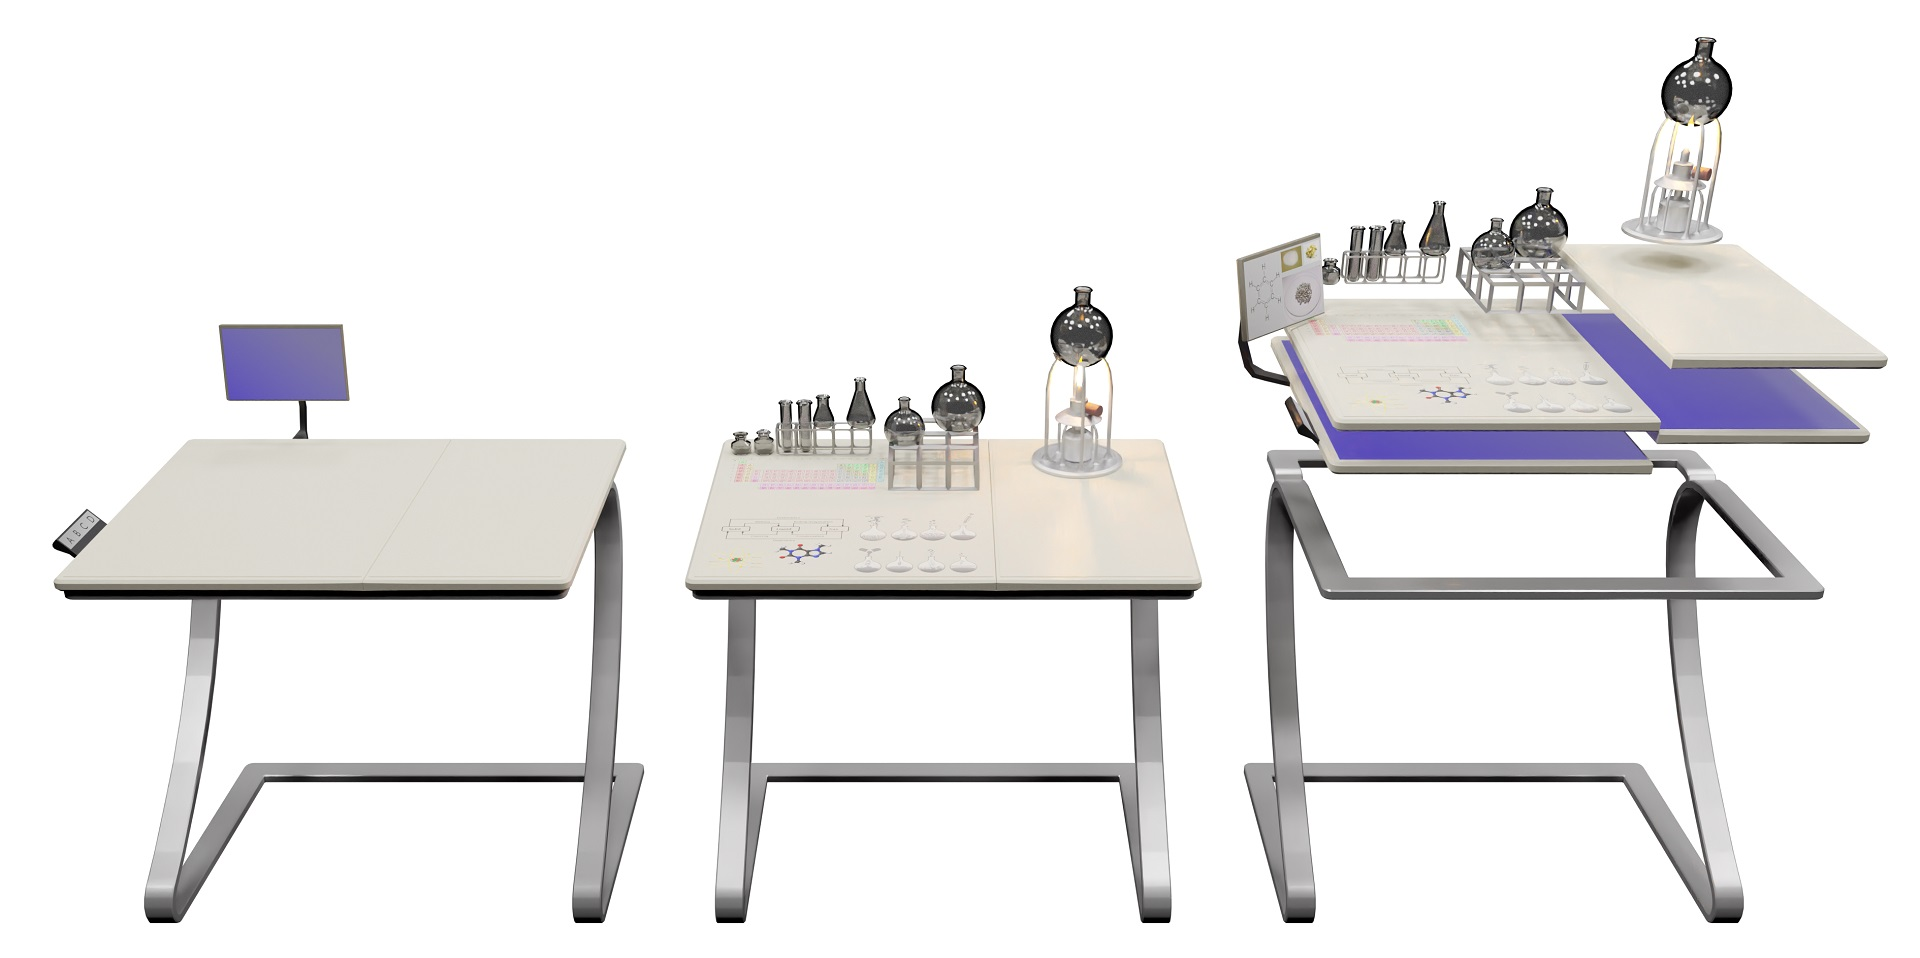 3D Representation of the Intelligent Student Desk (modDesk)